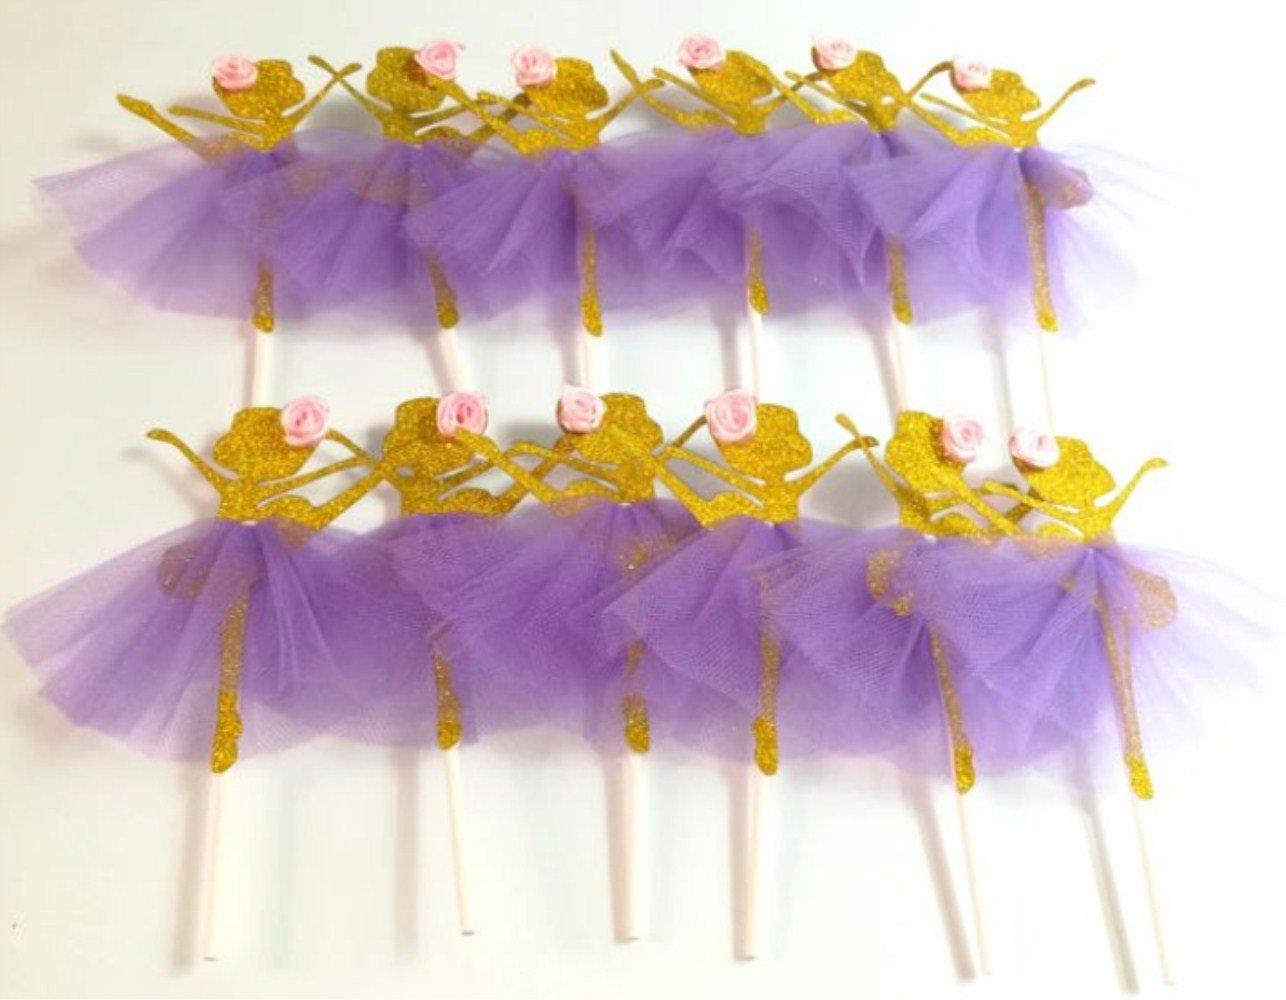 LASLU Cute Ballet Dancer Girls Fairy Peri Dessert Muffin Cupcake Toppers for Picnic Wedding Baby Shower Birthday Party Server (Purple Skirt)